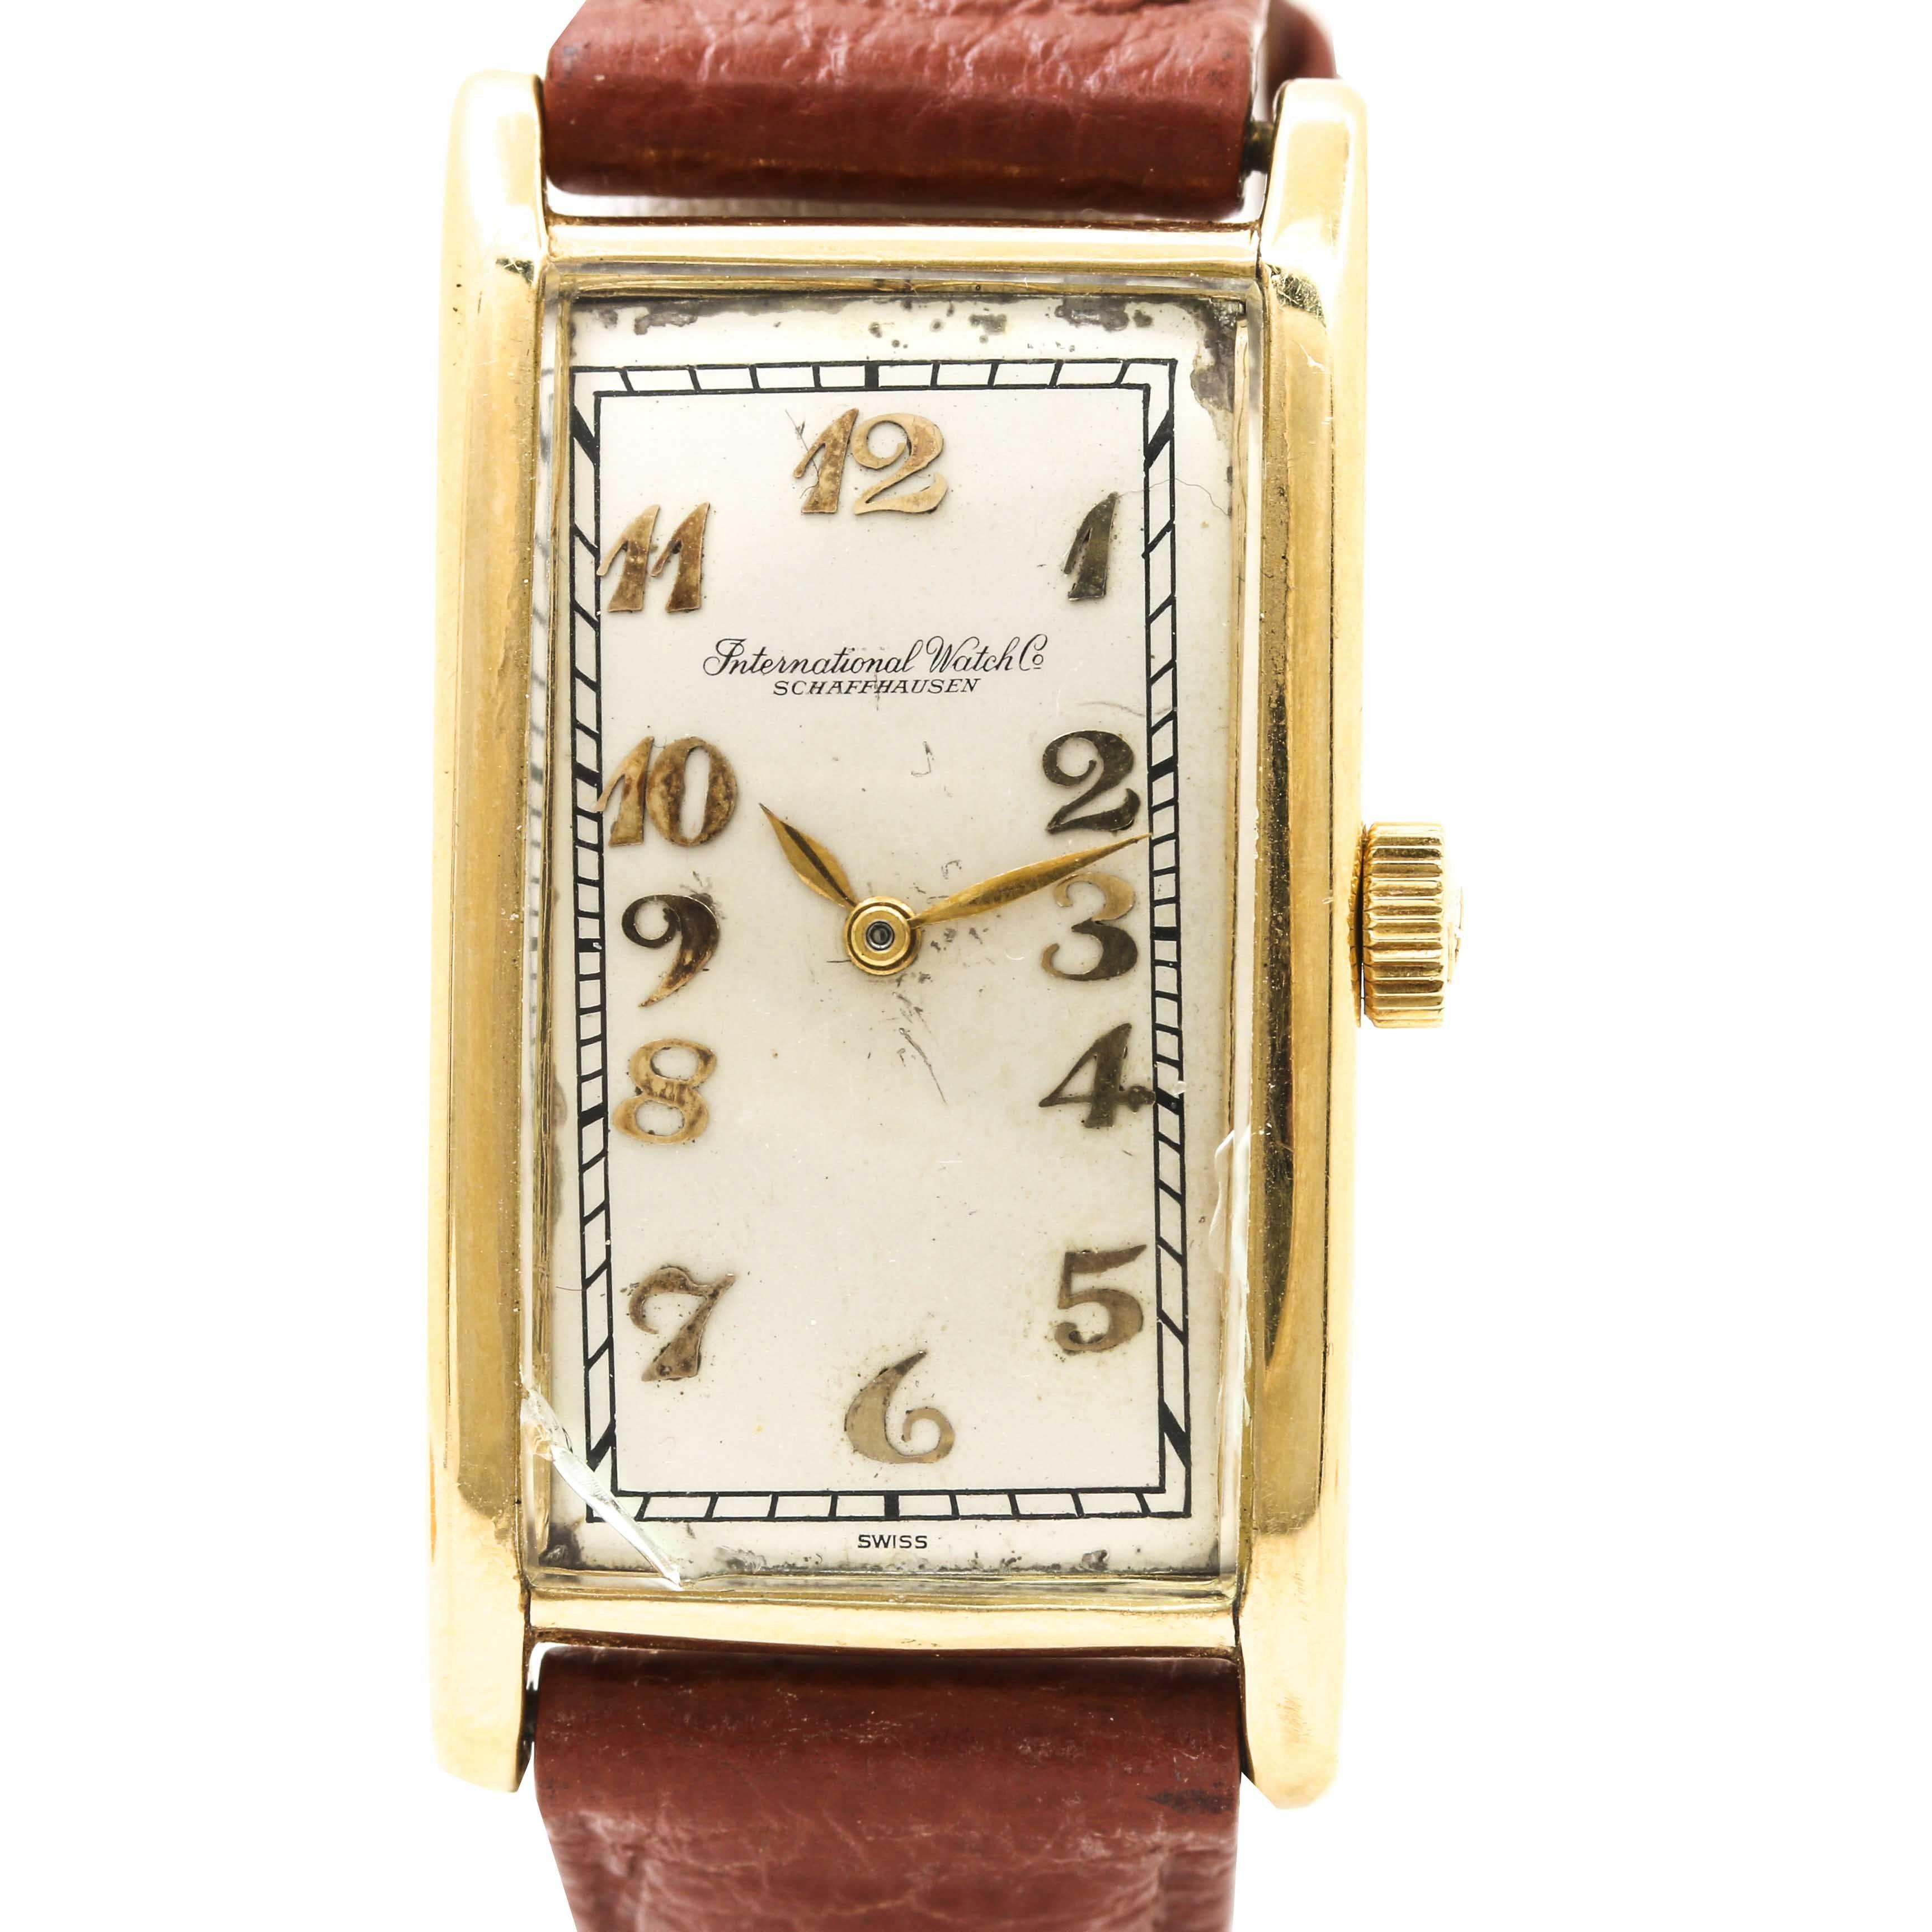 International Watch Co. 18K Yellow Gold Wristwatch